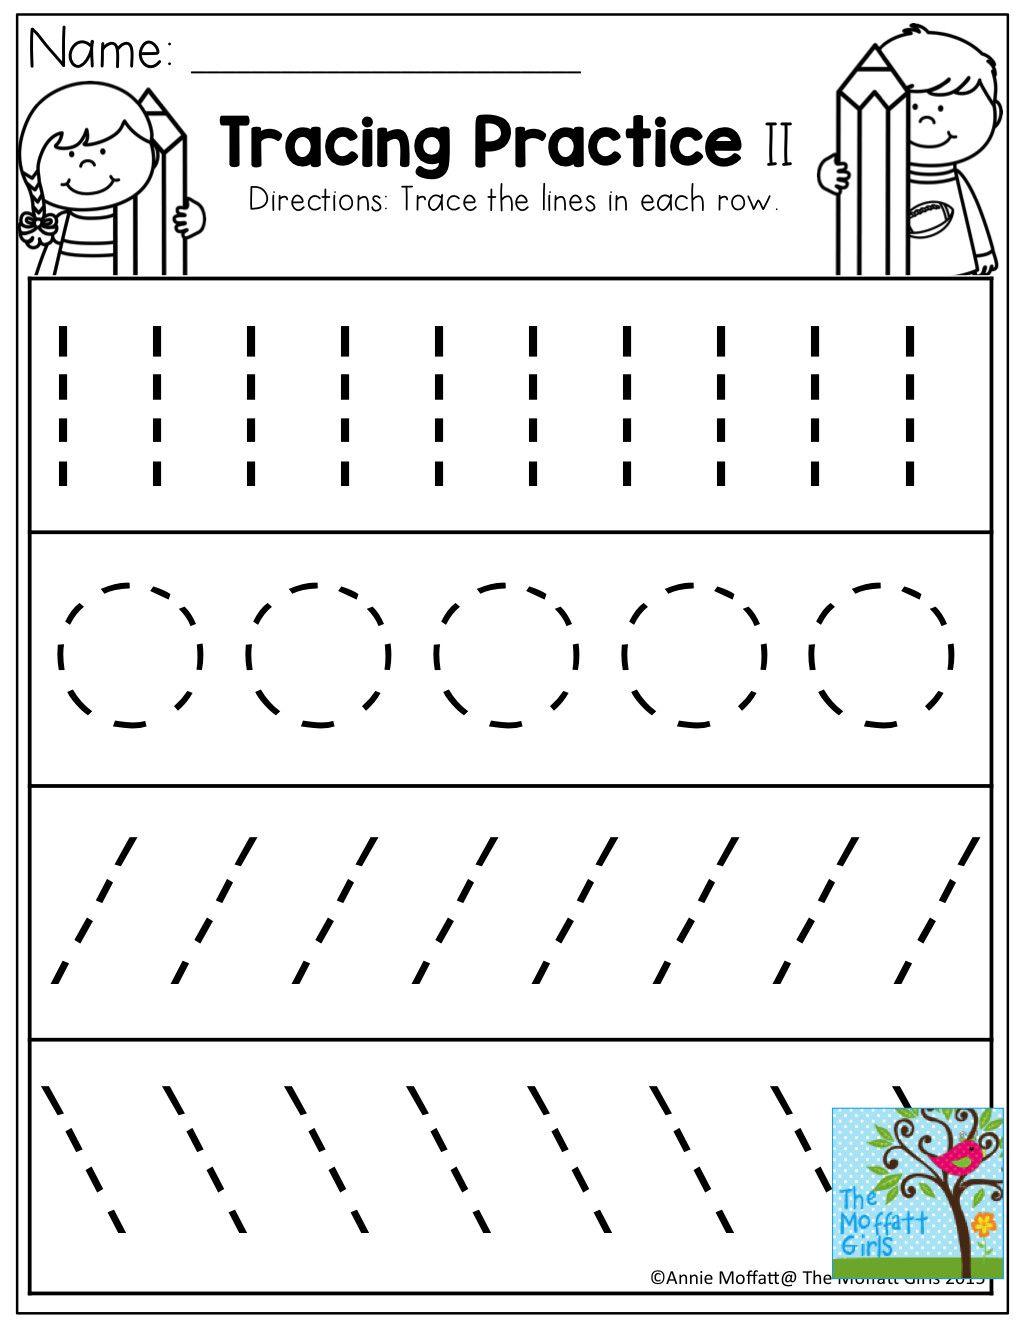 4 Preschool Line Tracing Worksheets Tracing Worksheets Preschool Preschool Tracing Preschool Writing